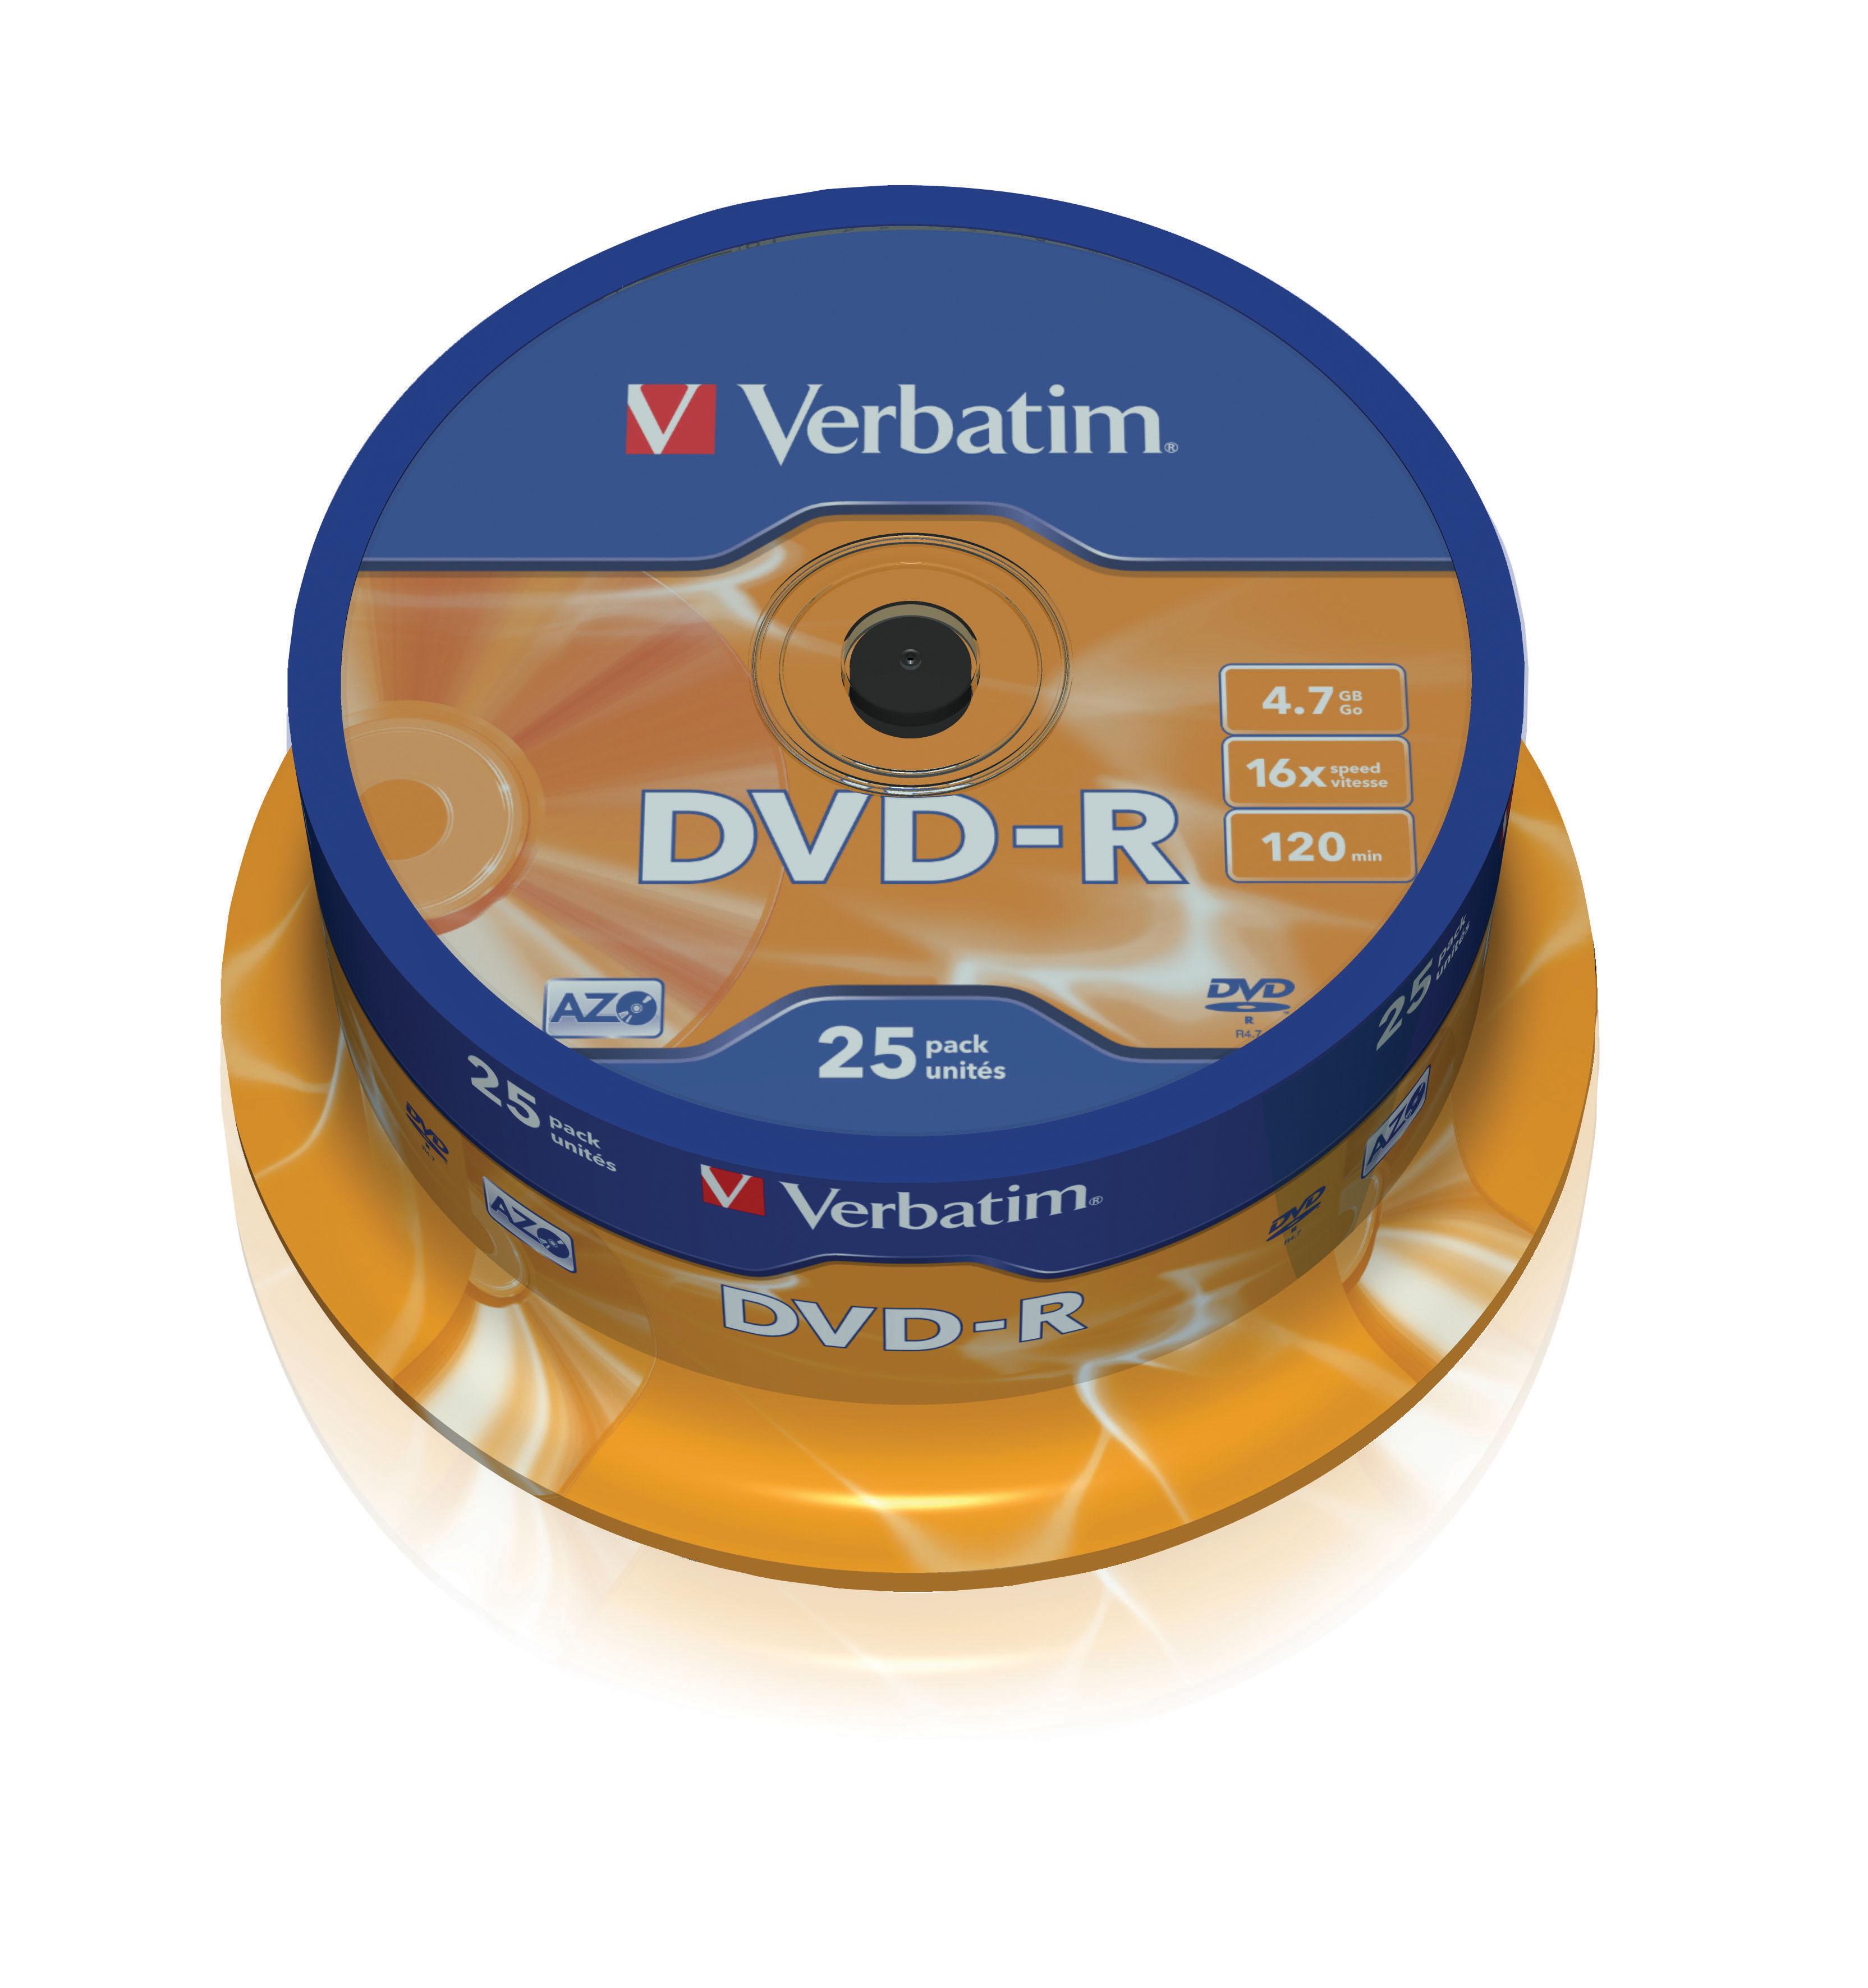 Verbatim DVD-R 16x 25pk Spindle 43522 - CMS01